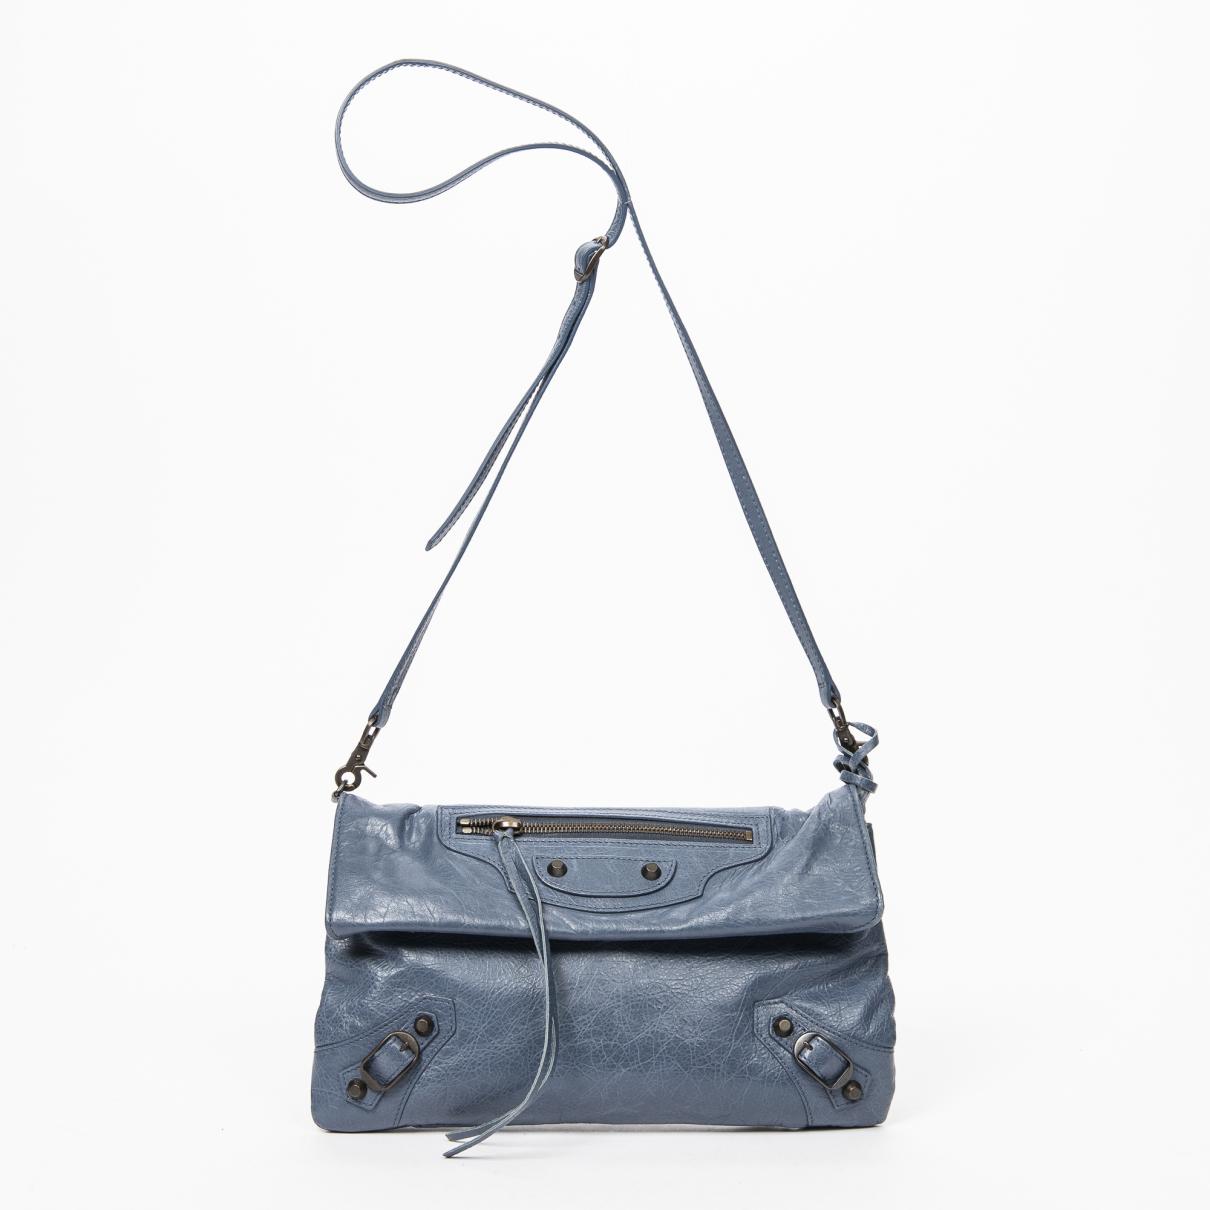 Balenciaga - Sac a main   pour femme en cuir - bleu